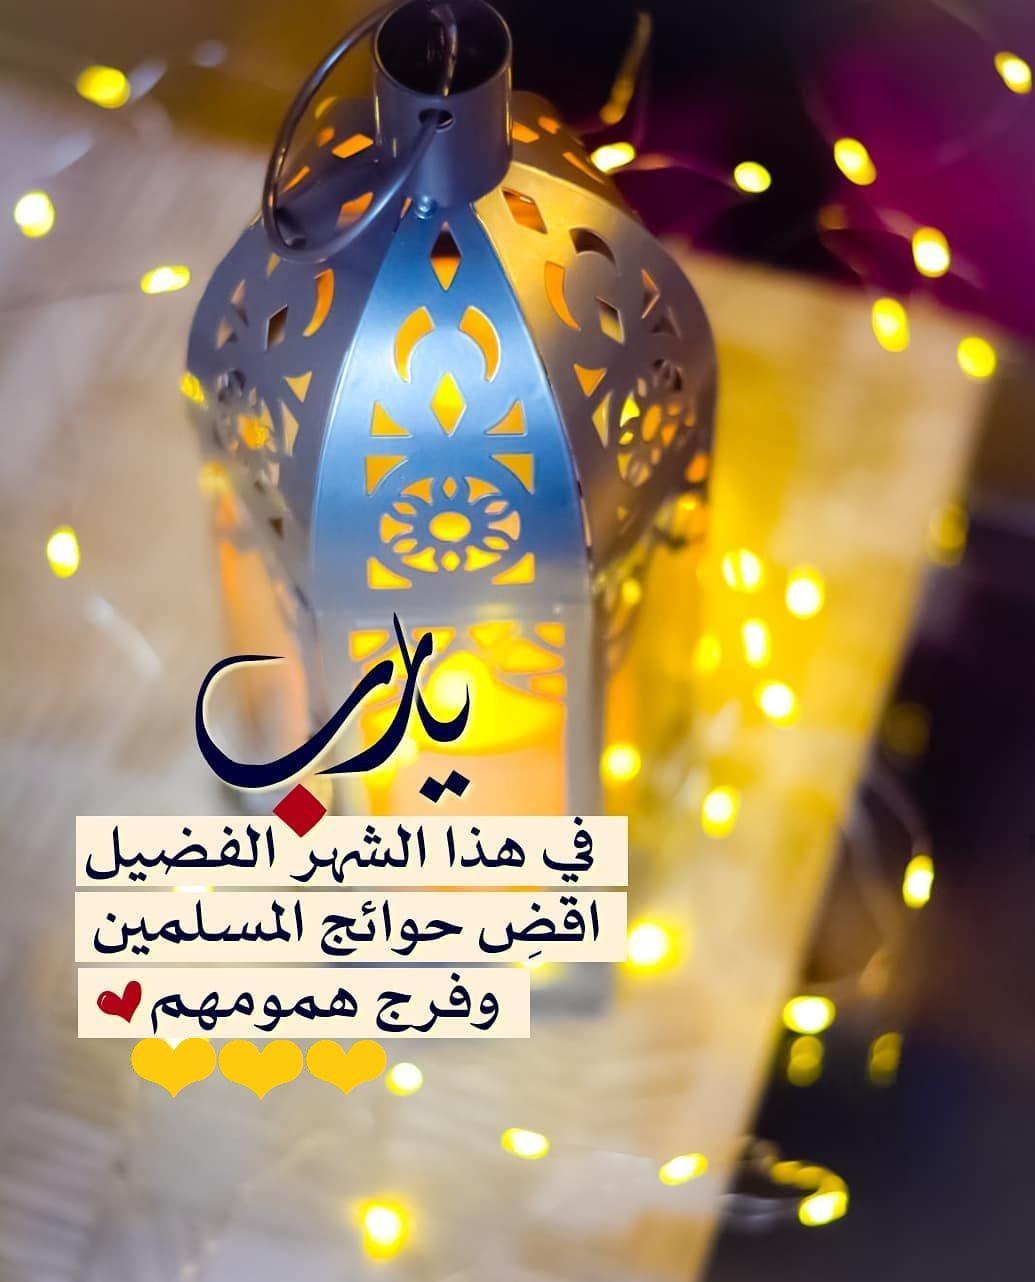 Pin By Ayat Murad On Ramadanشهر الرحمة Christmas Bulbs Christmas Ornaments Holiday Decor